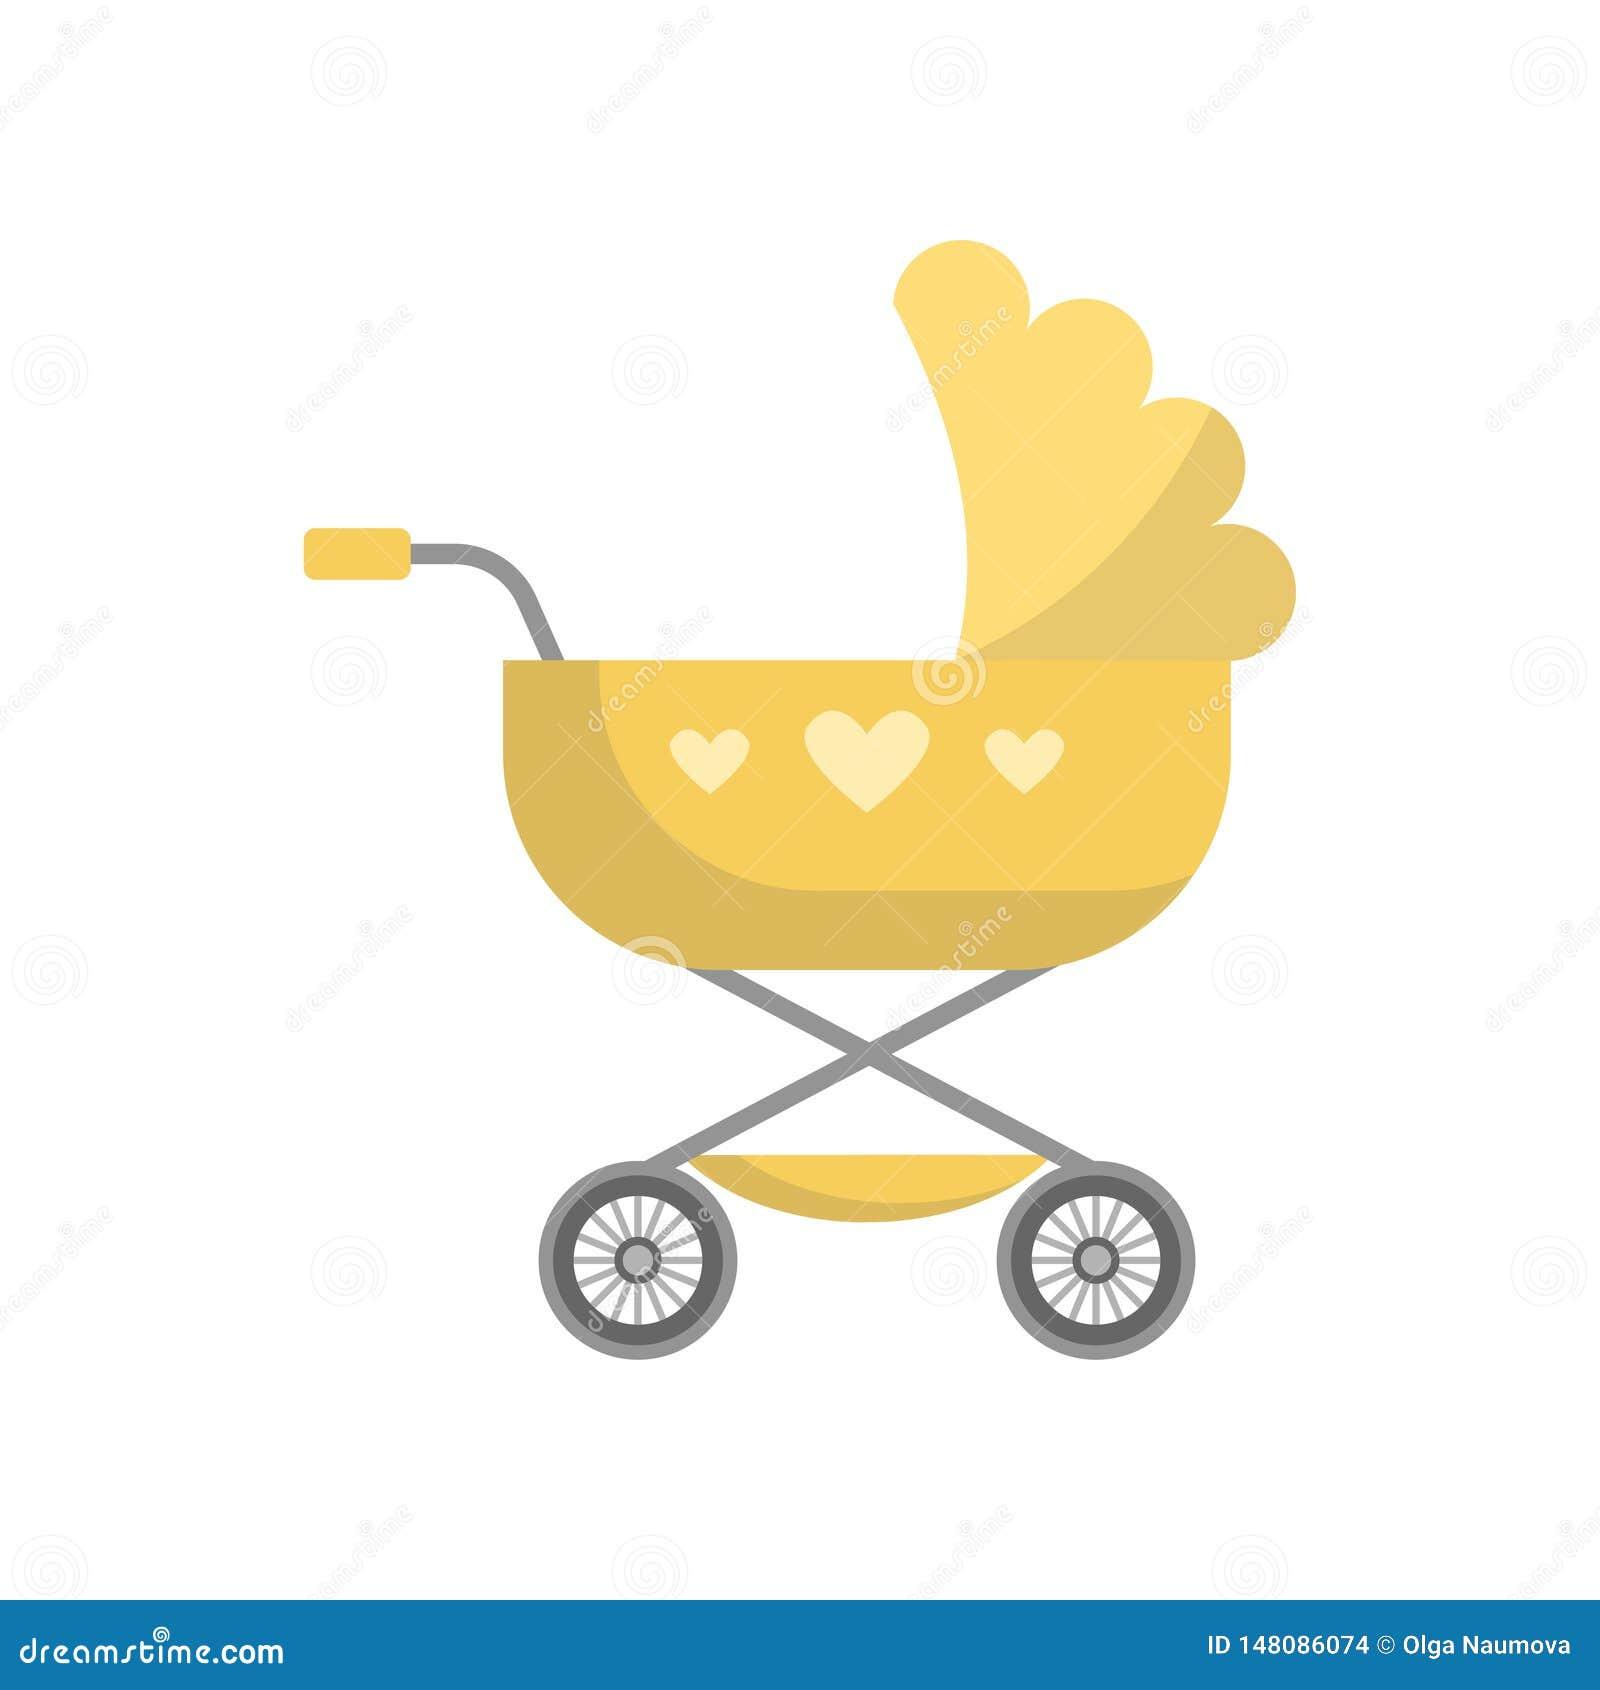 baby pram clipart free vectors -134 downloads found at Vectorportal